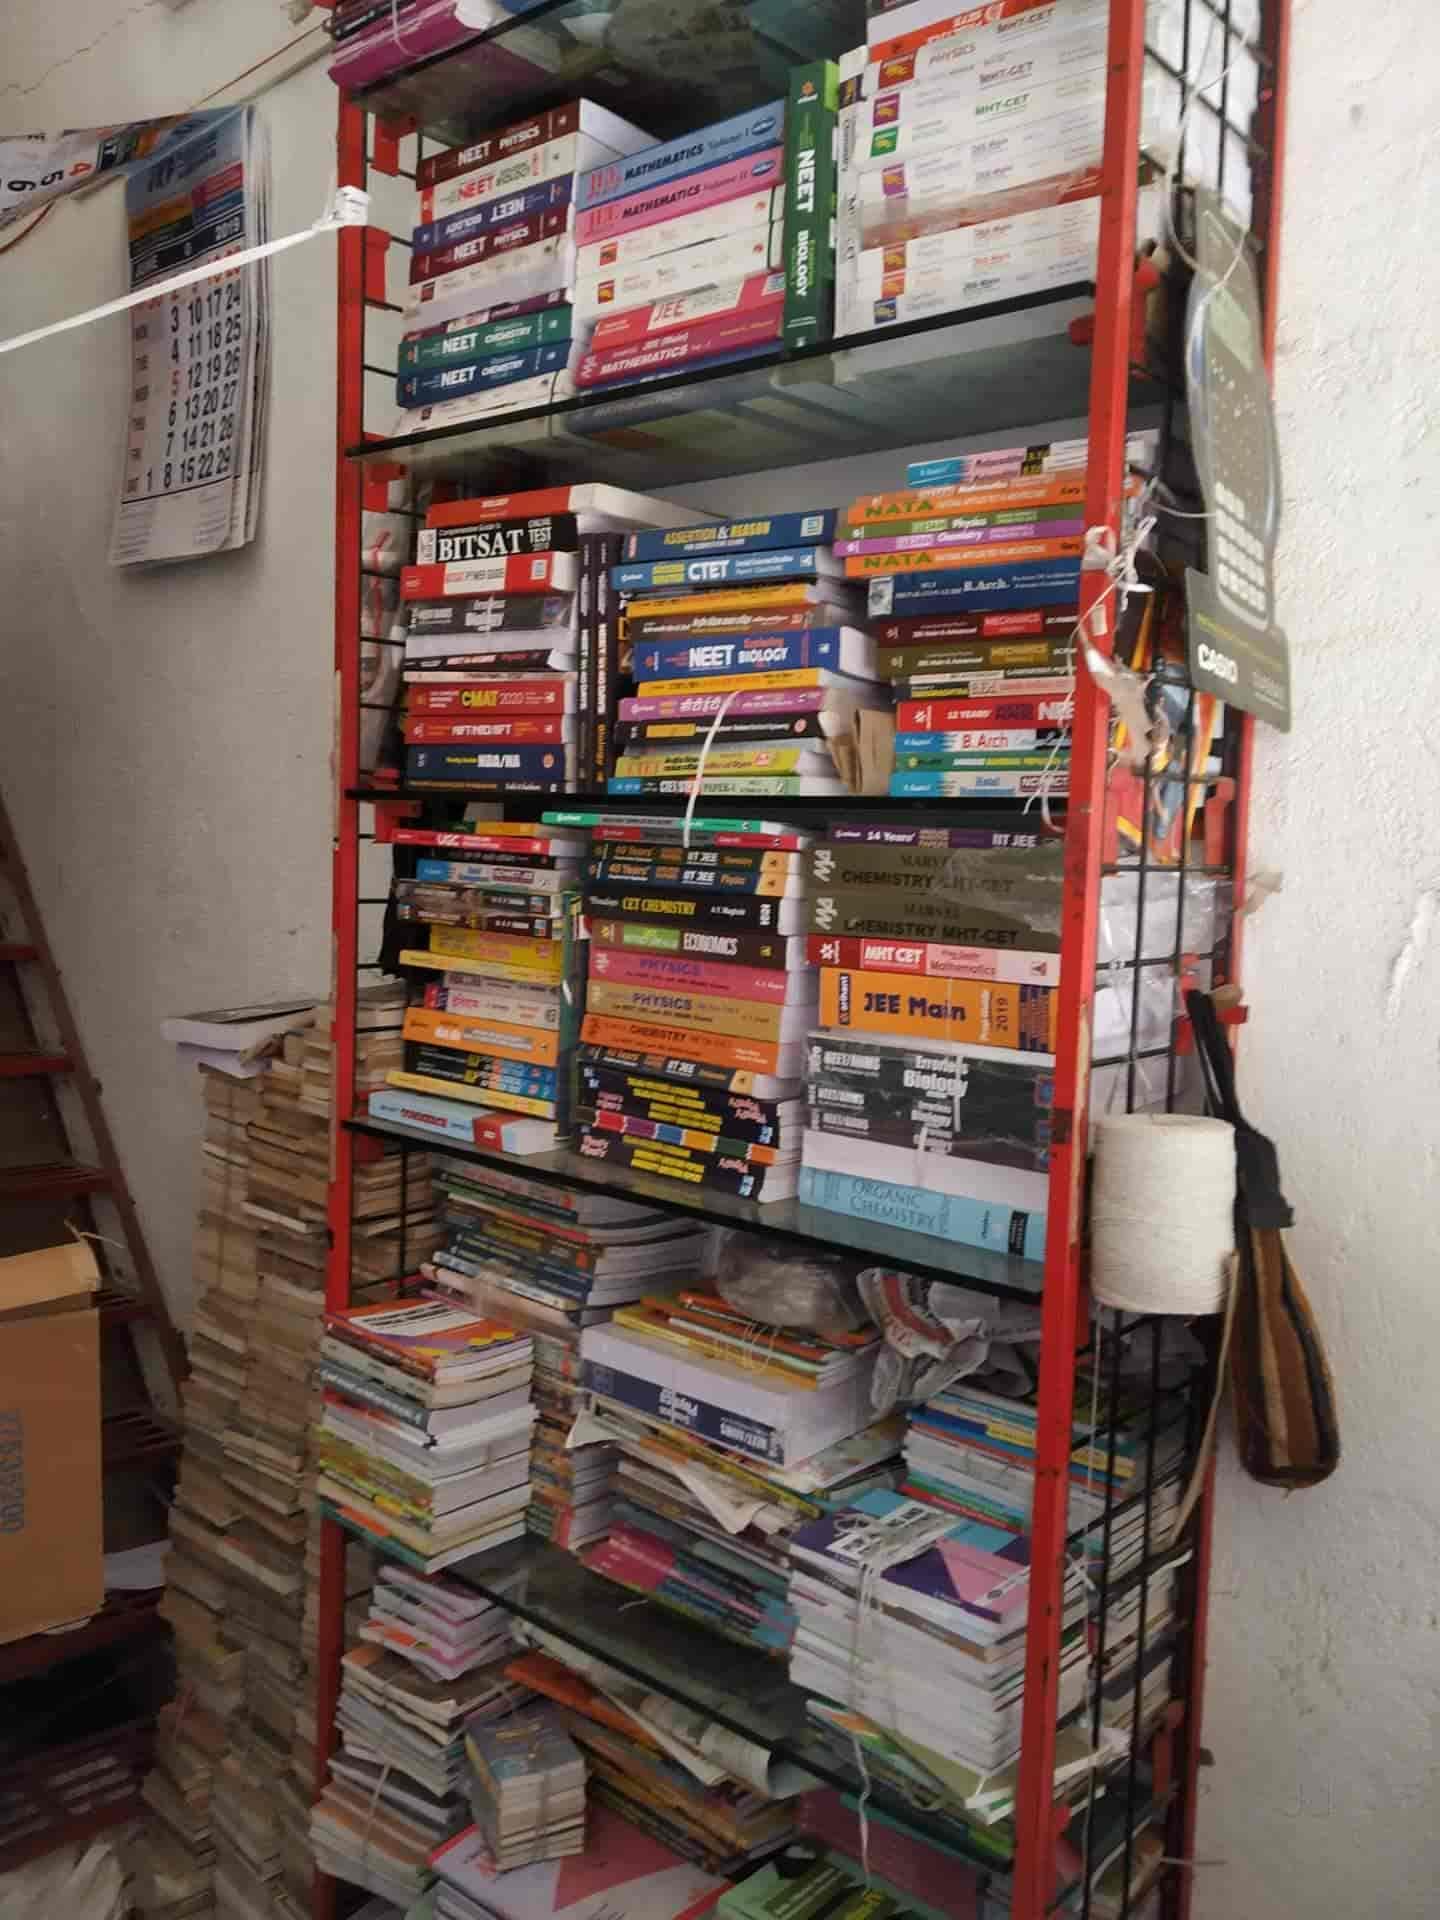 Laxmi Book Depot, Thane West - Book Shops in Thane, Mumbai - Justdial